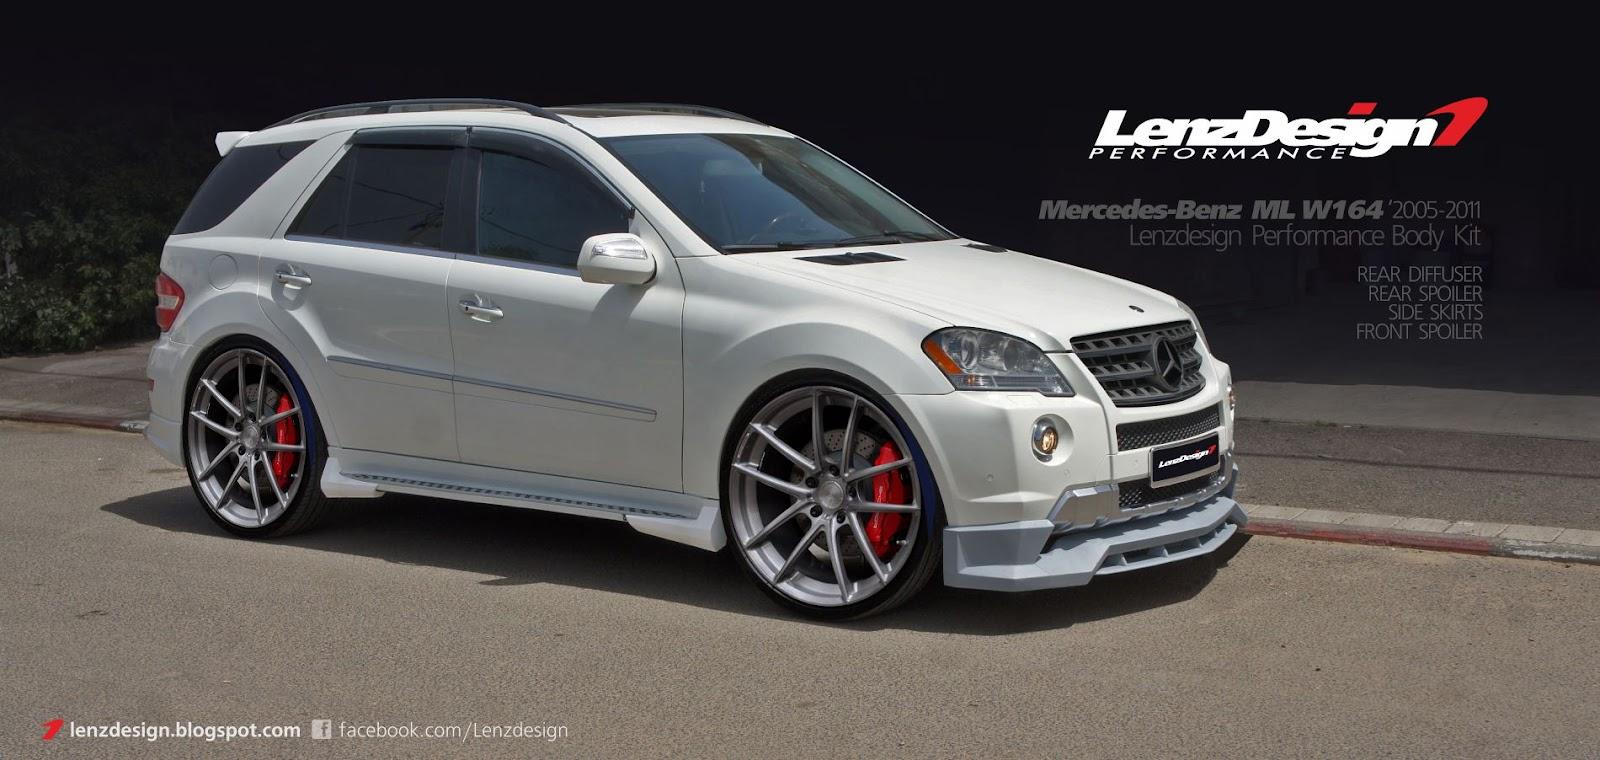 Mercedes benz ml w164 tuning wide body kit lenzdesign for Mercedes benz body kit